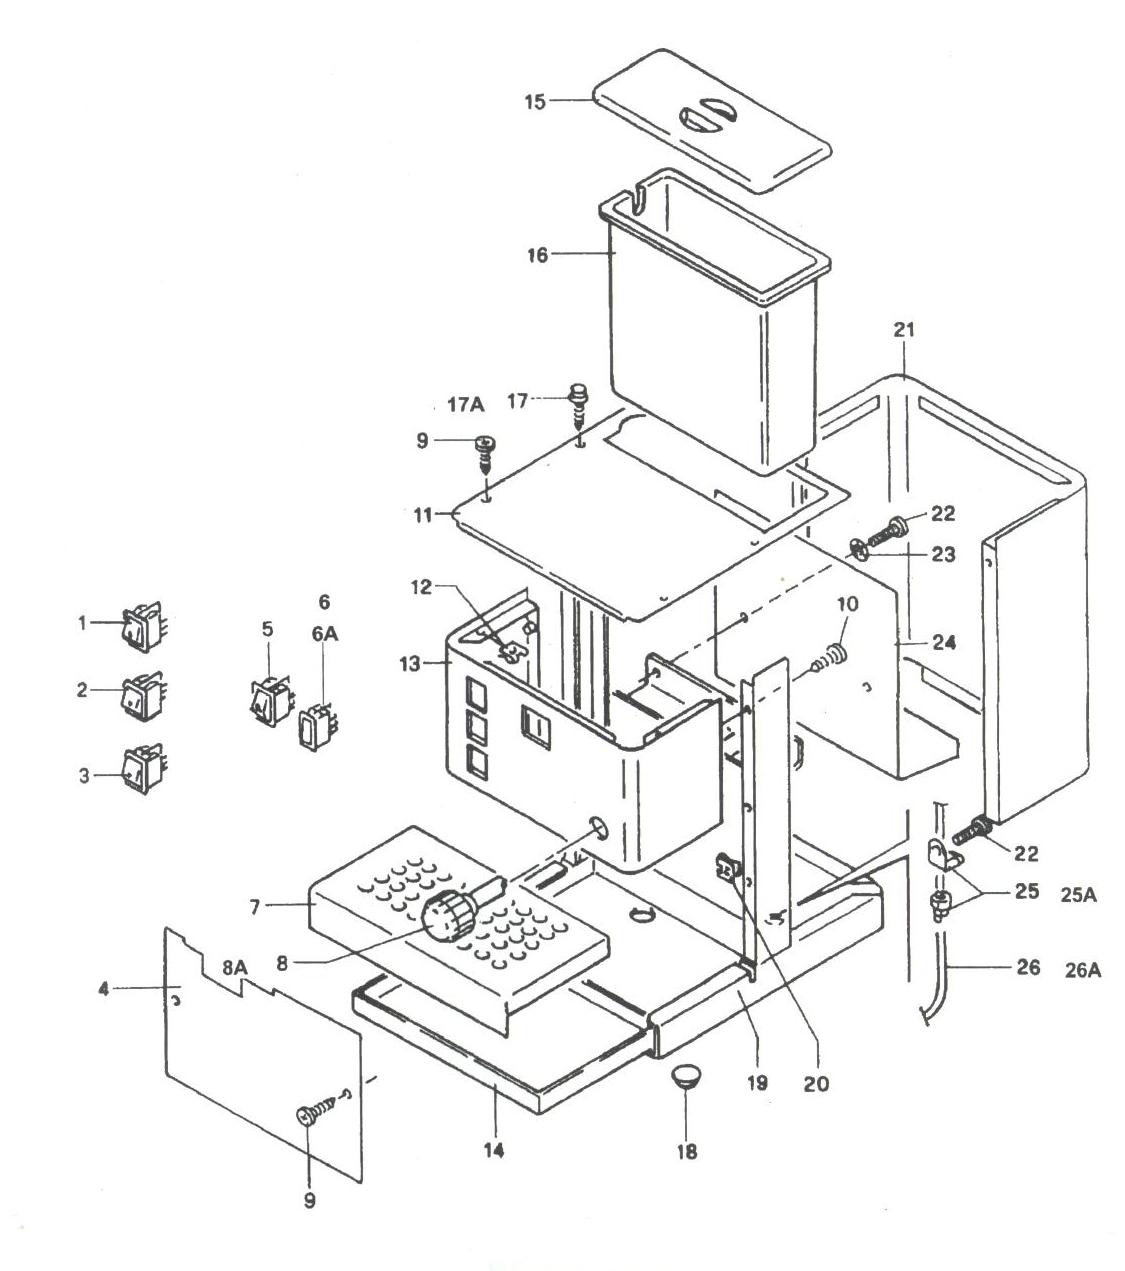 rancilio silvia wiring schematic